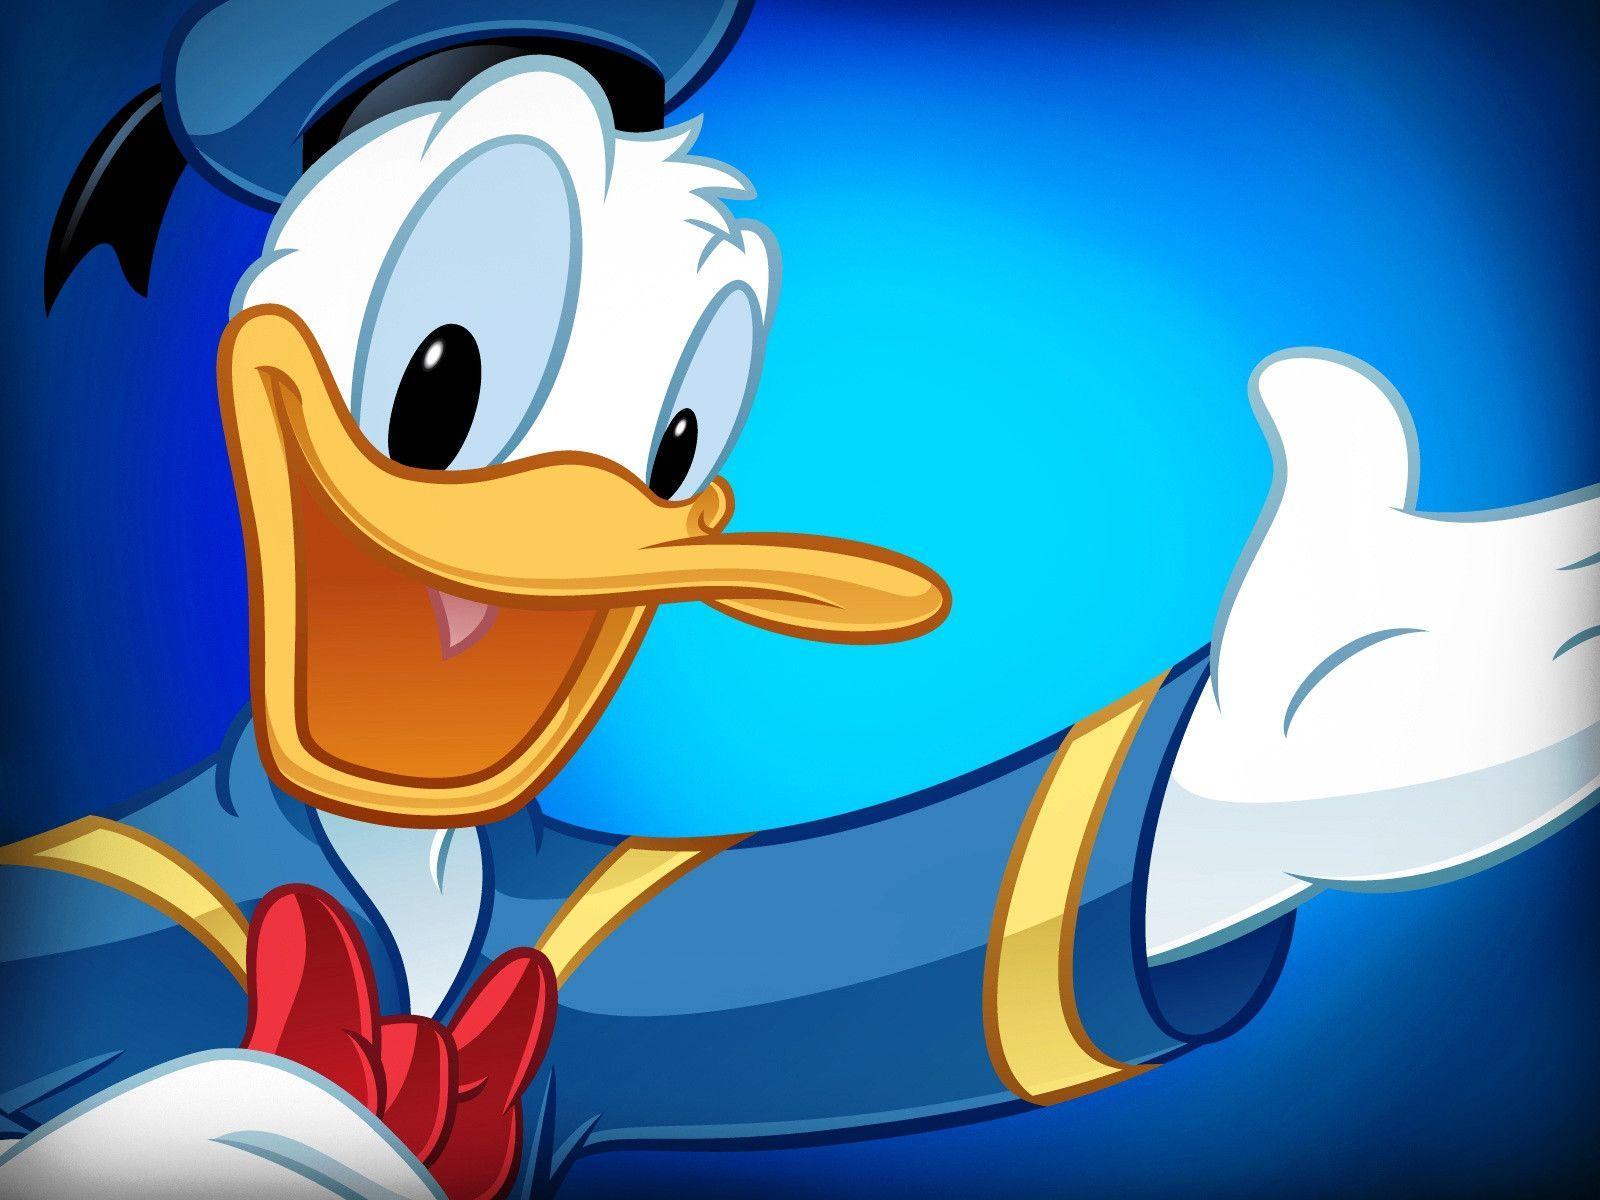 Donald Duck Wallpapers - Wallpaper Cave